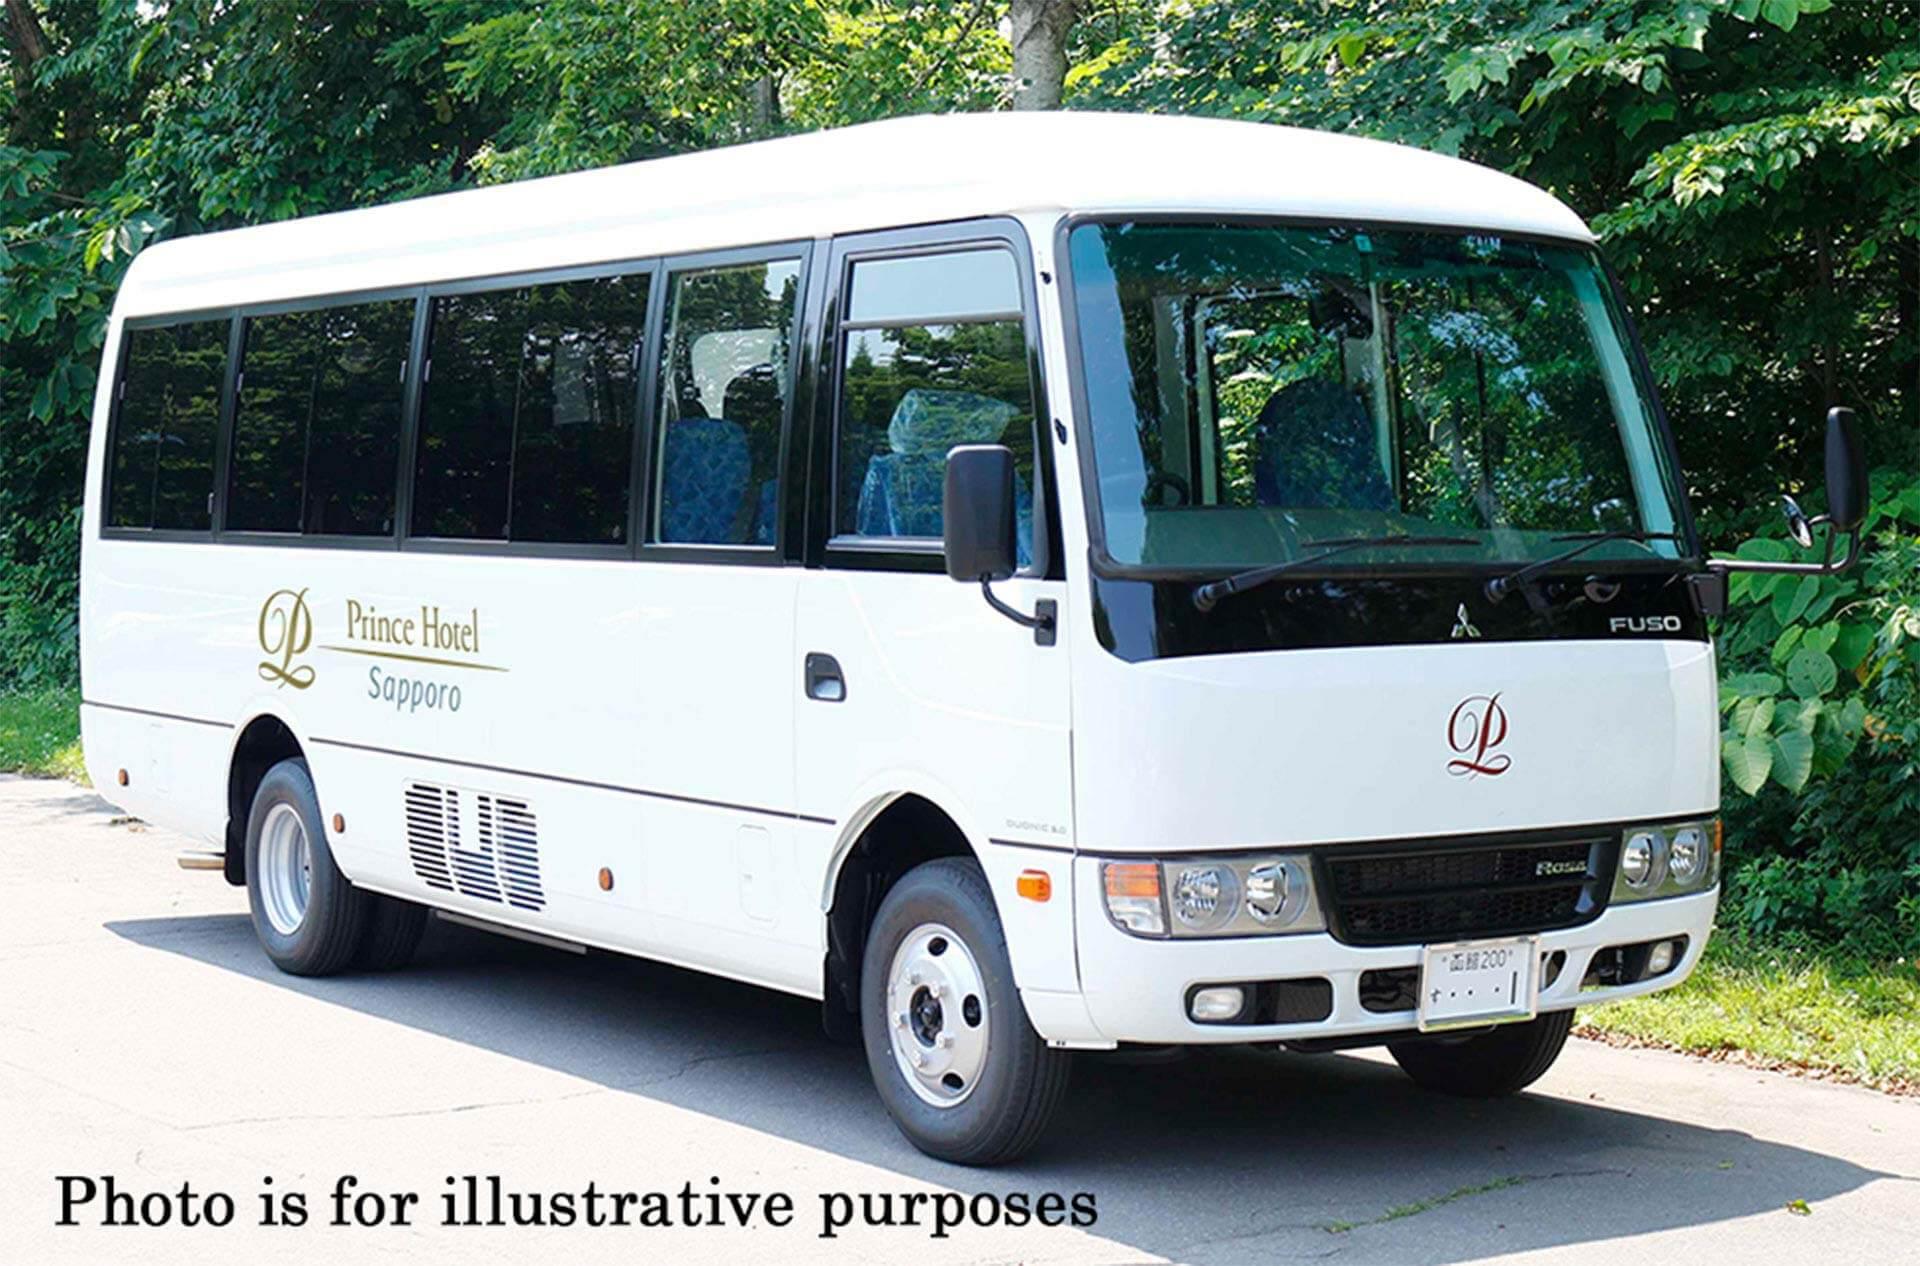 """Free Shuttle Bus Services"" Will Start on February 1, 2018 (Thursday)"